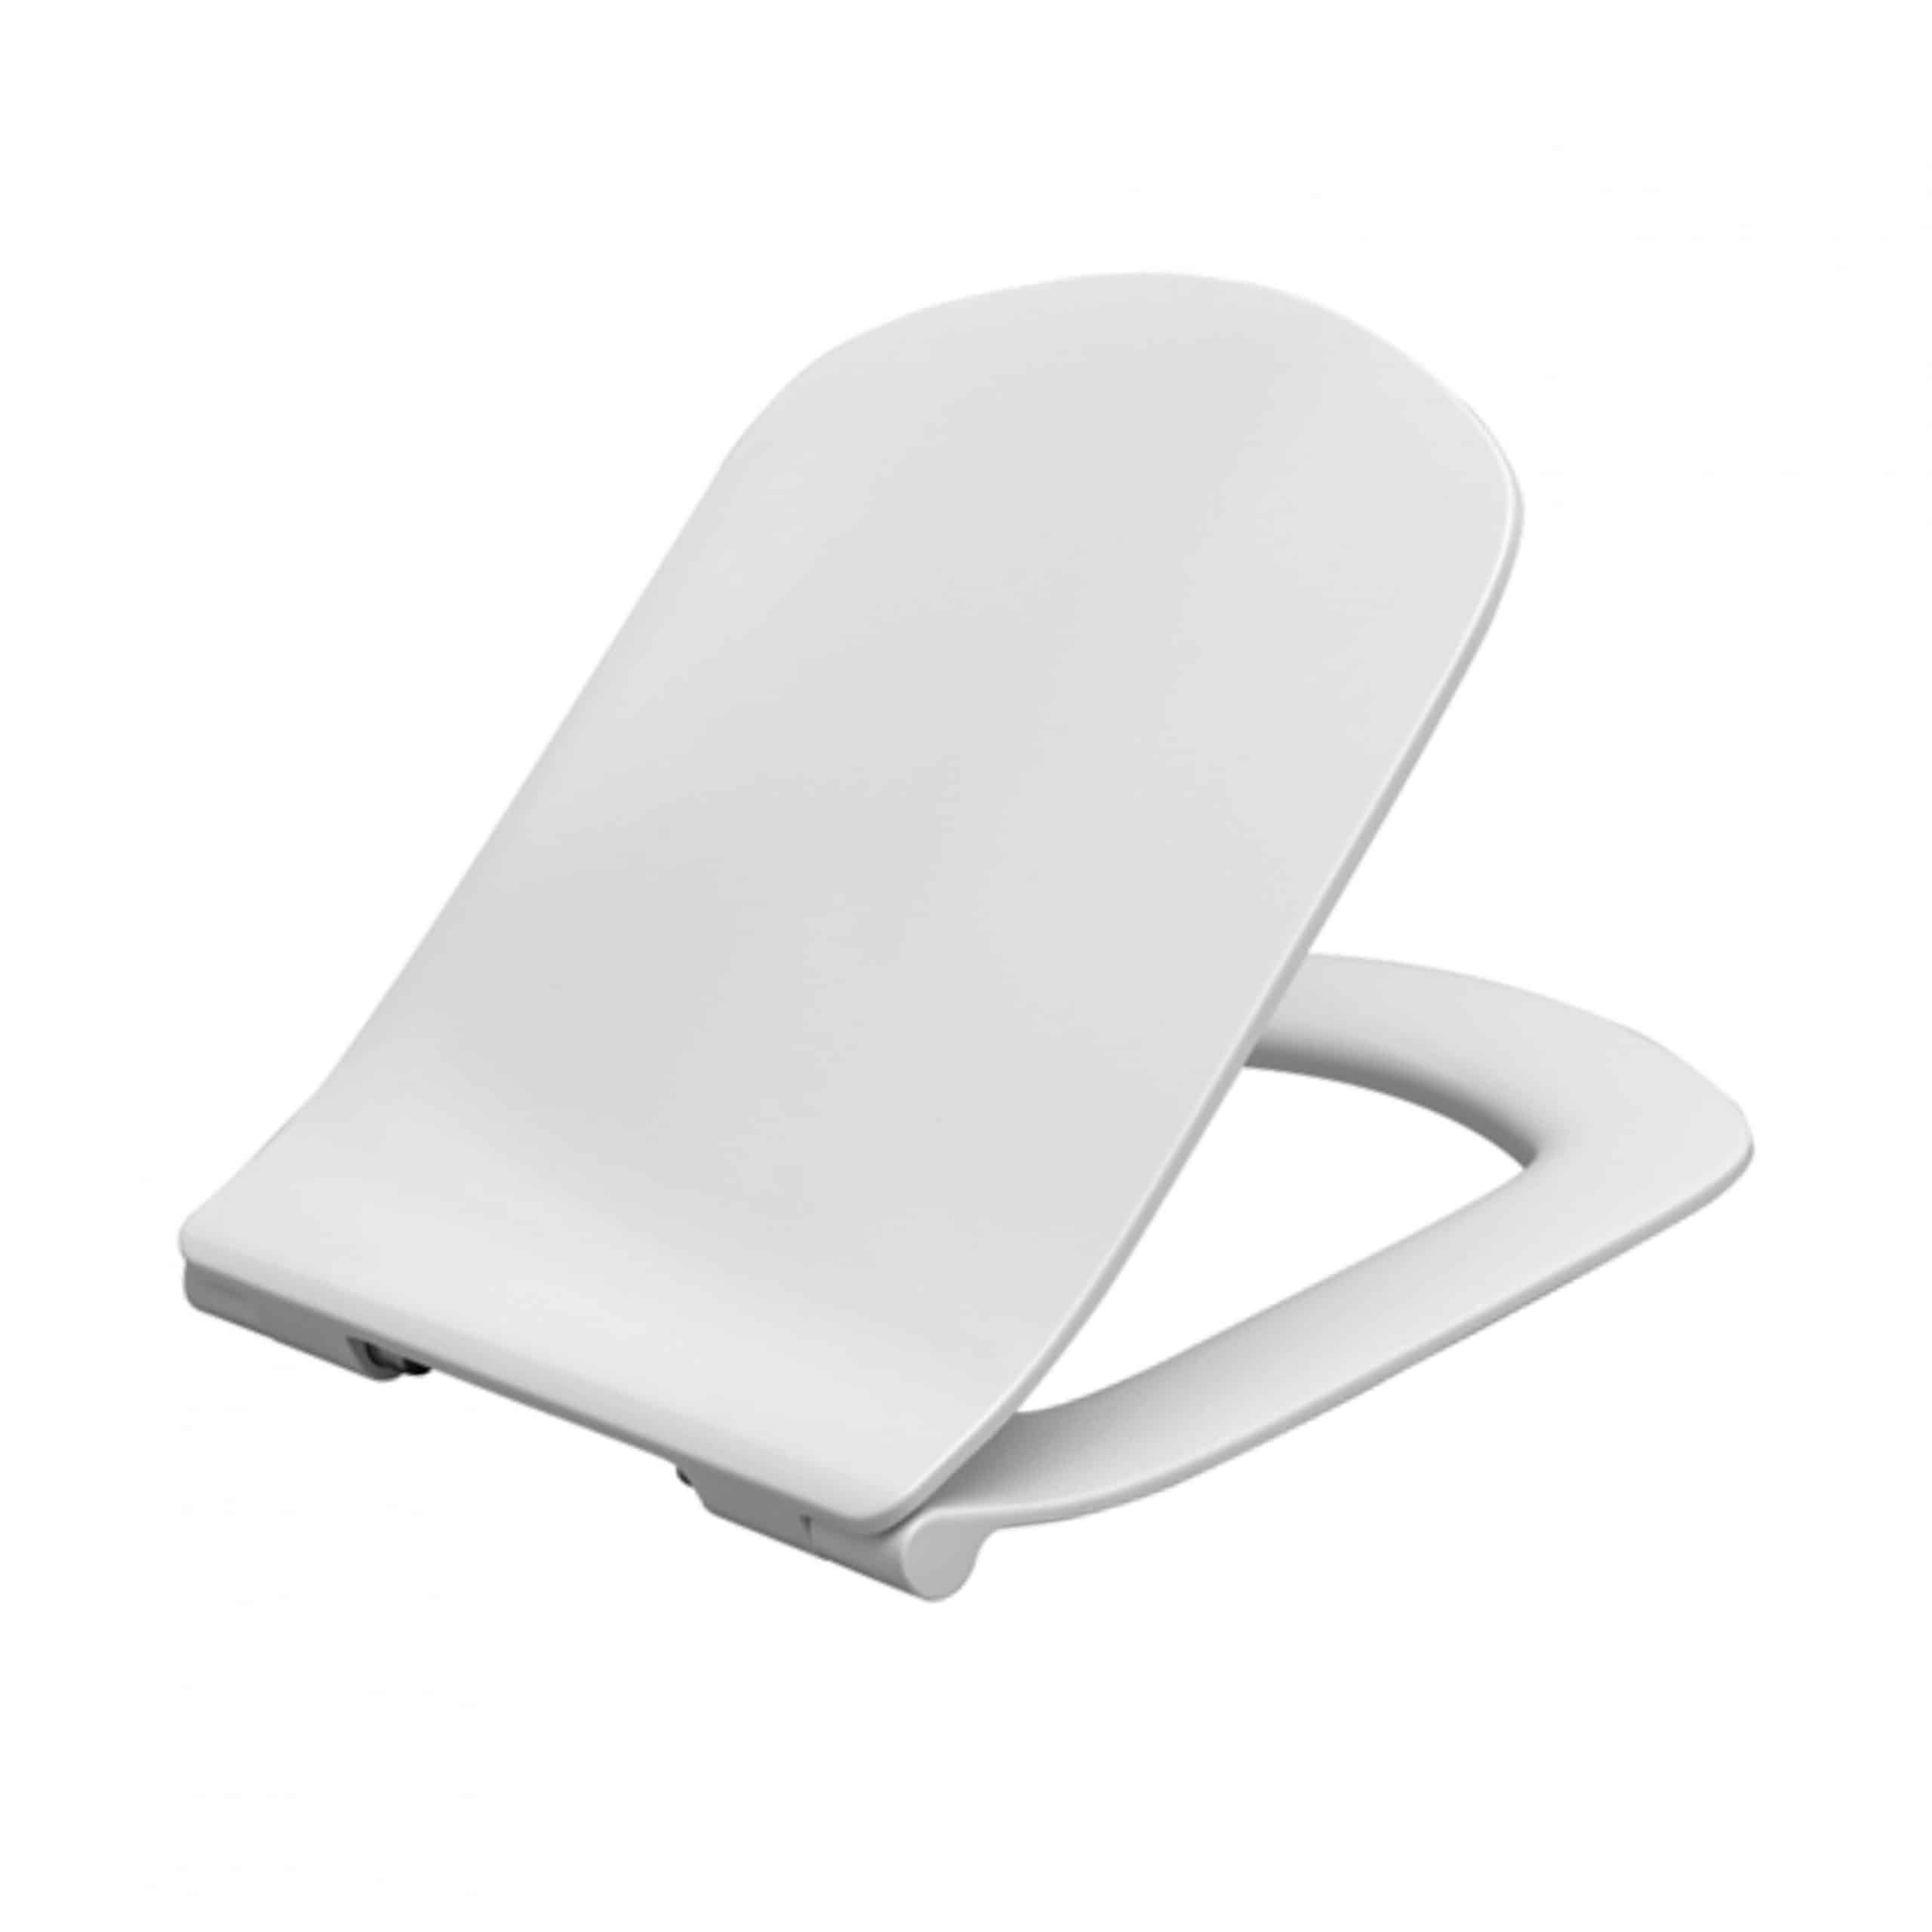 Roca Senso Slim Seat White Z801513001